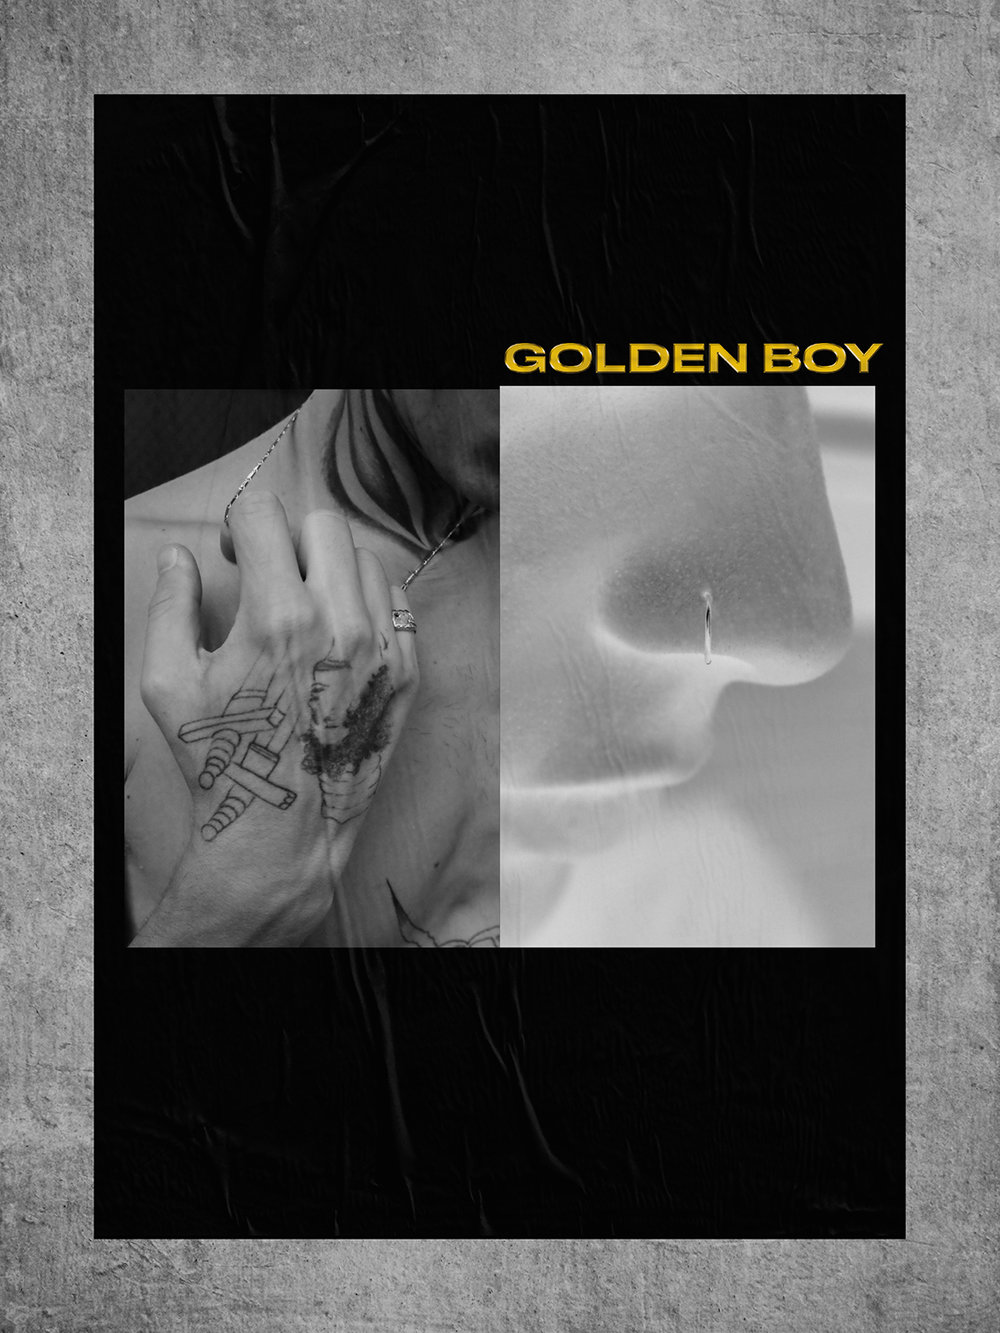 GoldenBoy-Poster4.jpg